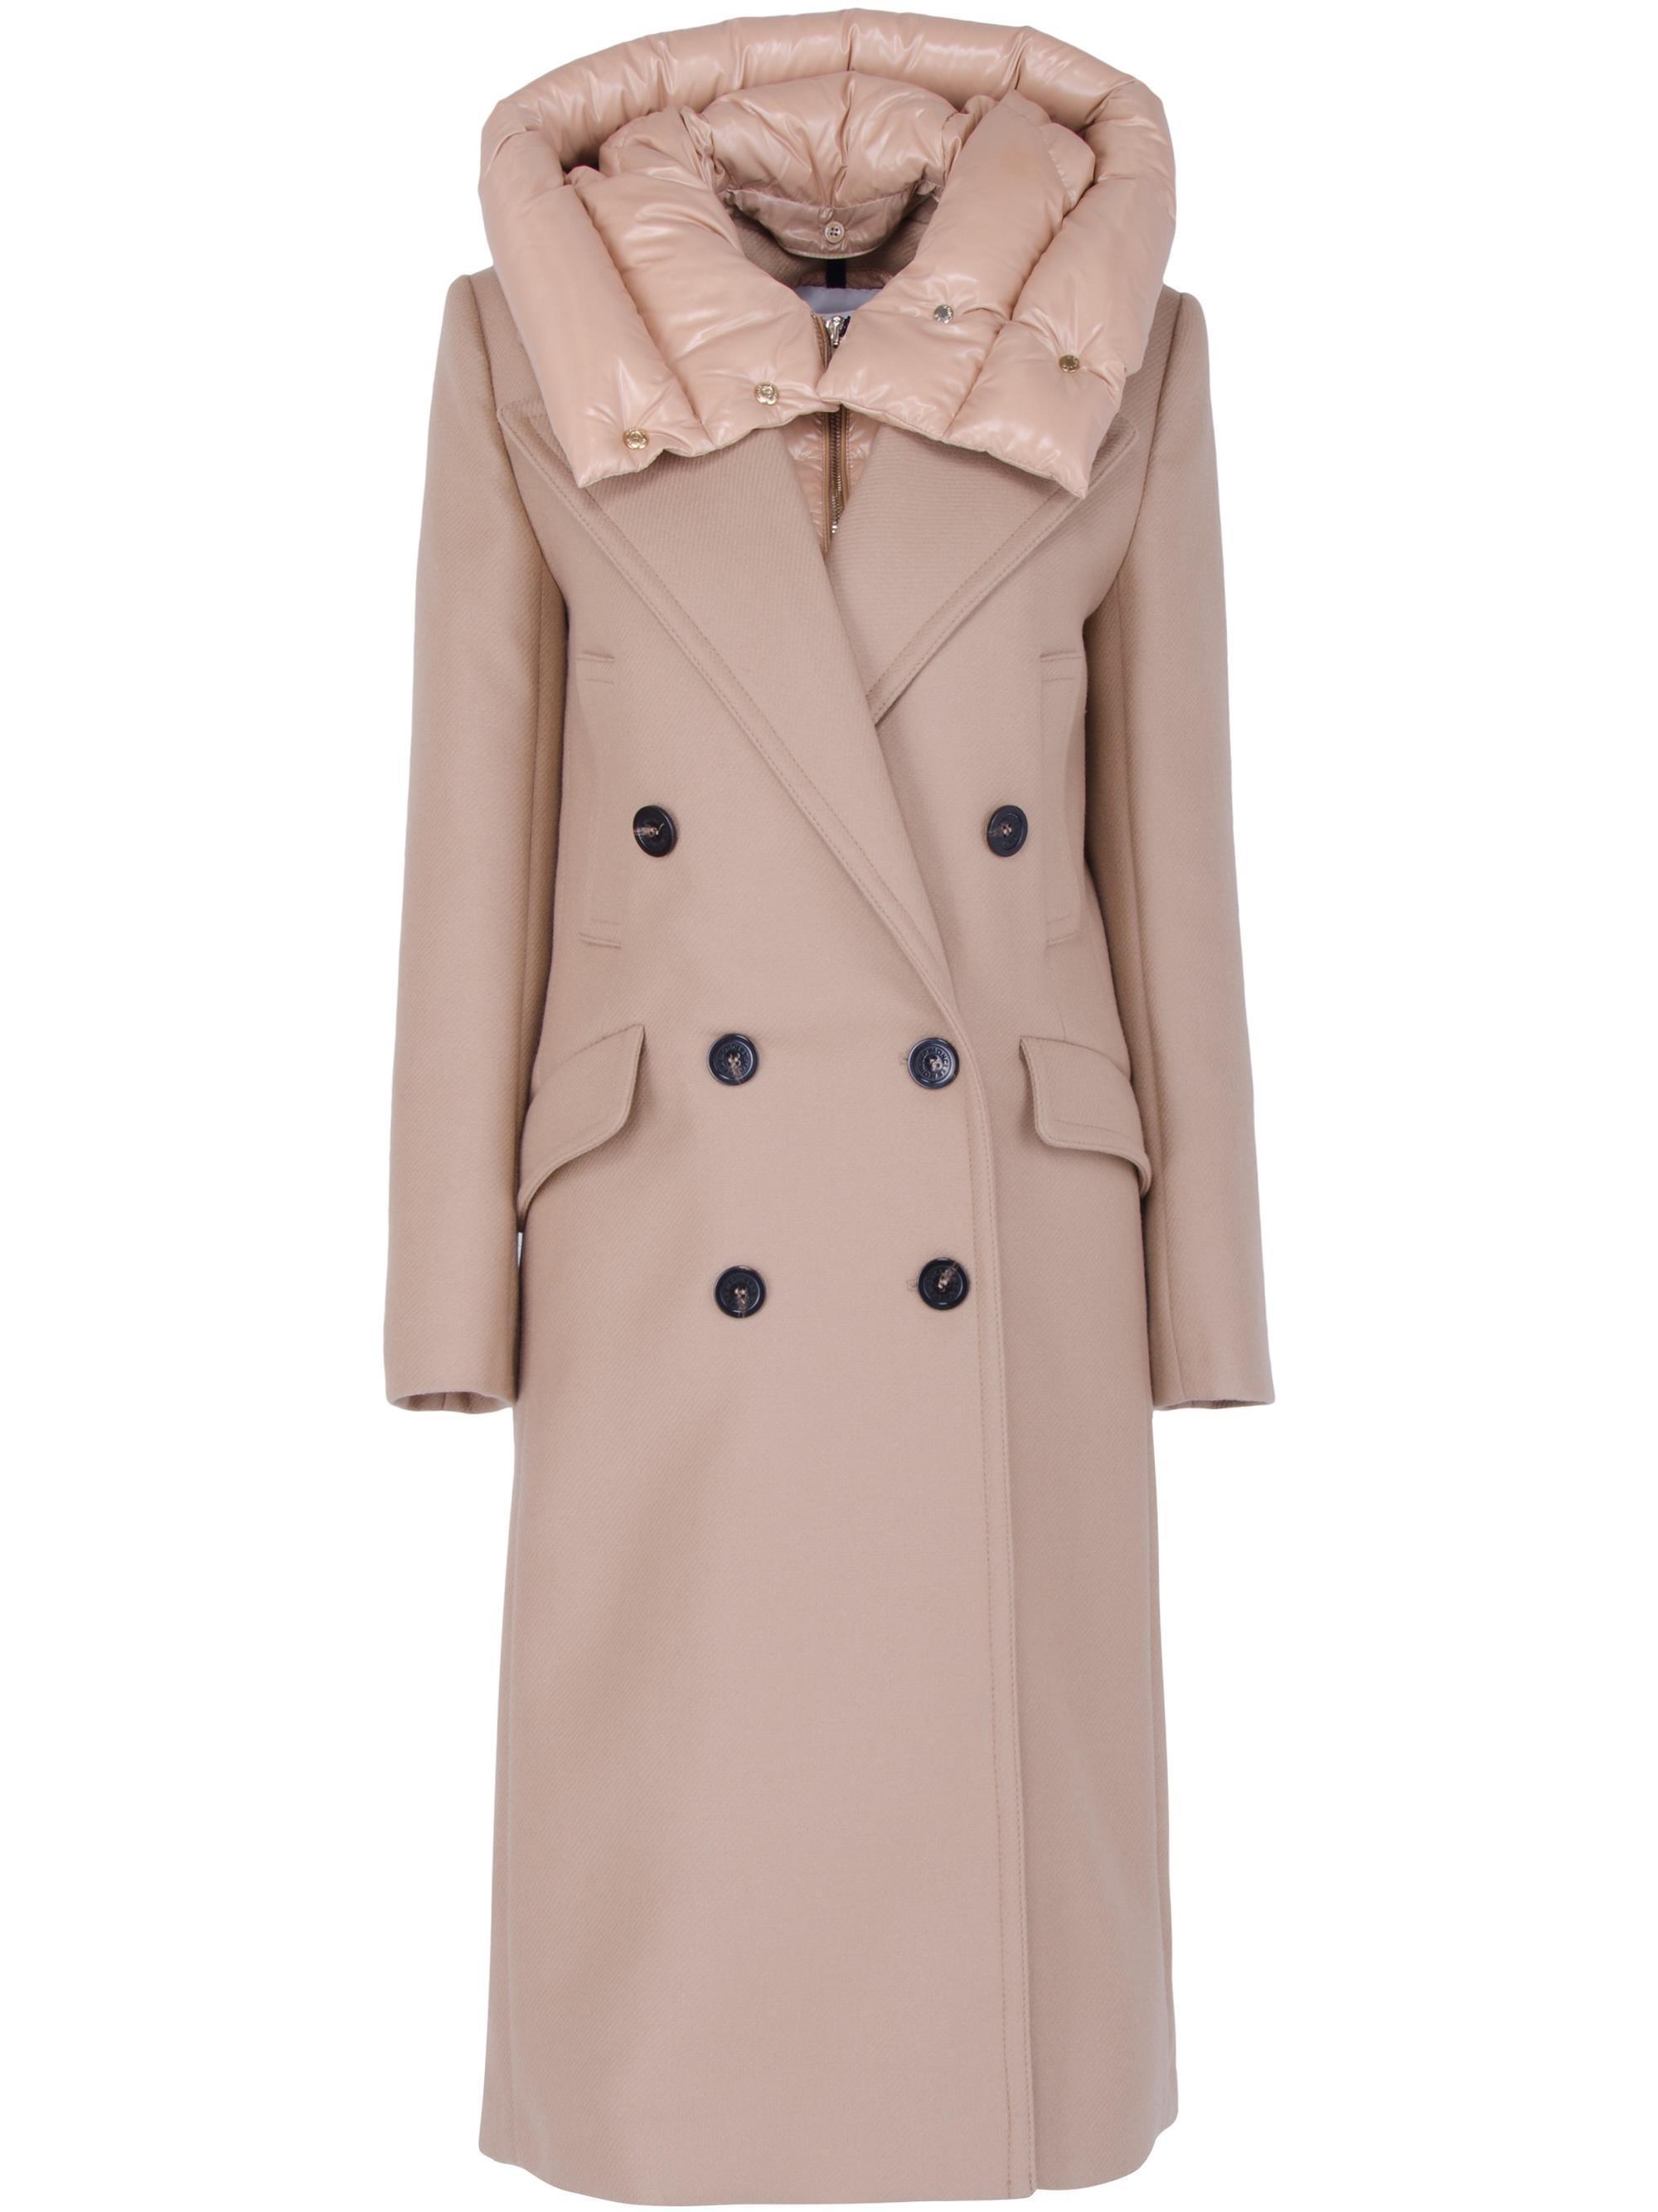 804ab70c44b buy mens down jackets with fur hood green moncler no.1945 151de b834c  real  lyst moncler acacia padded coat in natural 67dee b5cde